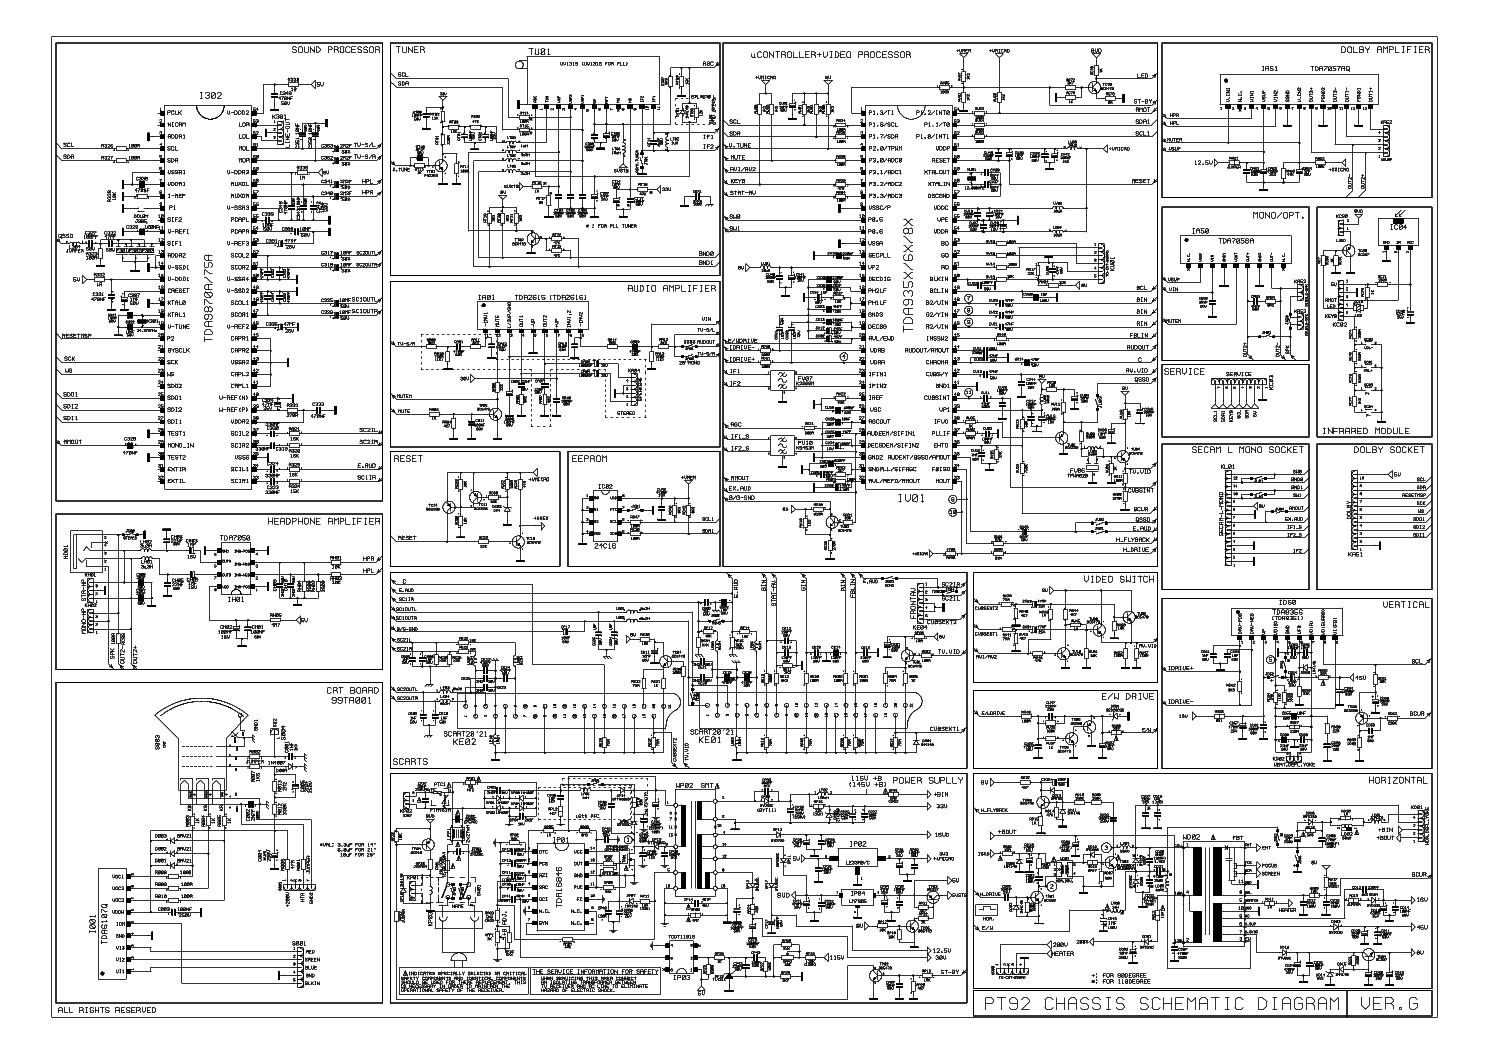 32lt75 service Manual